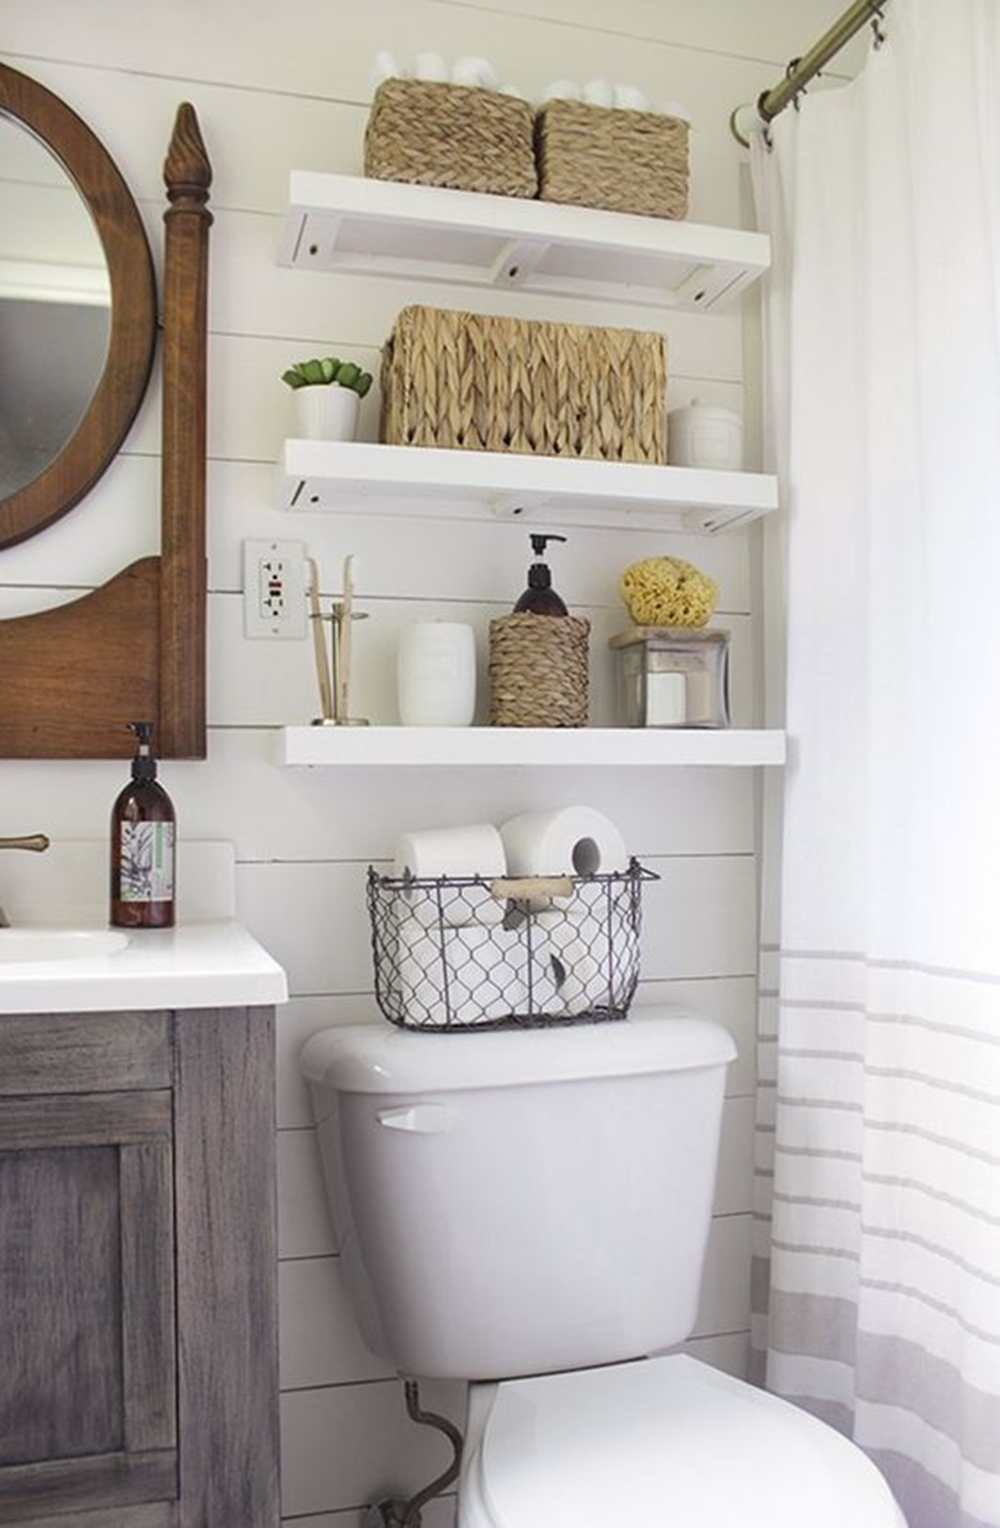 Bathroom Shelving Design Ideas ~ Best bathroom storage ideas and designs for